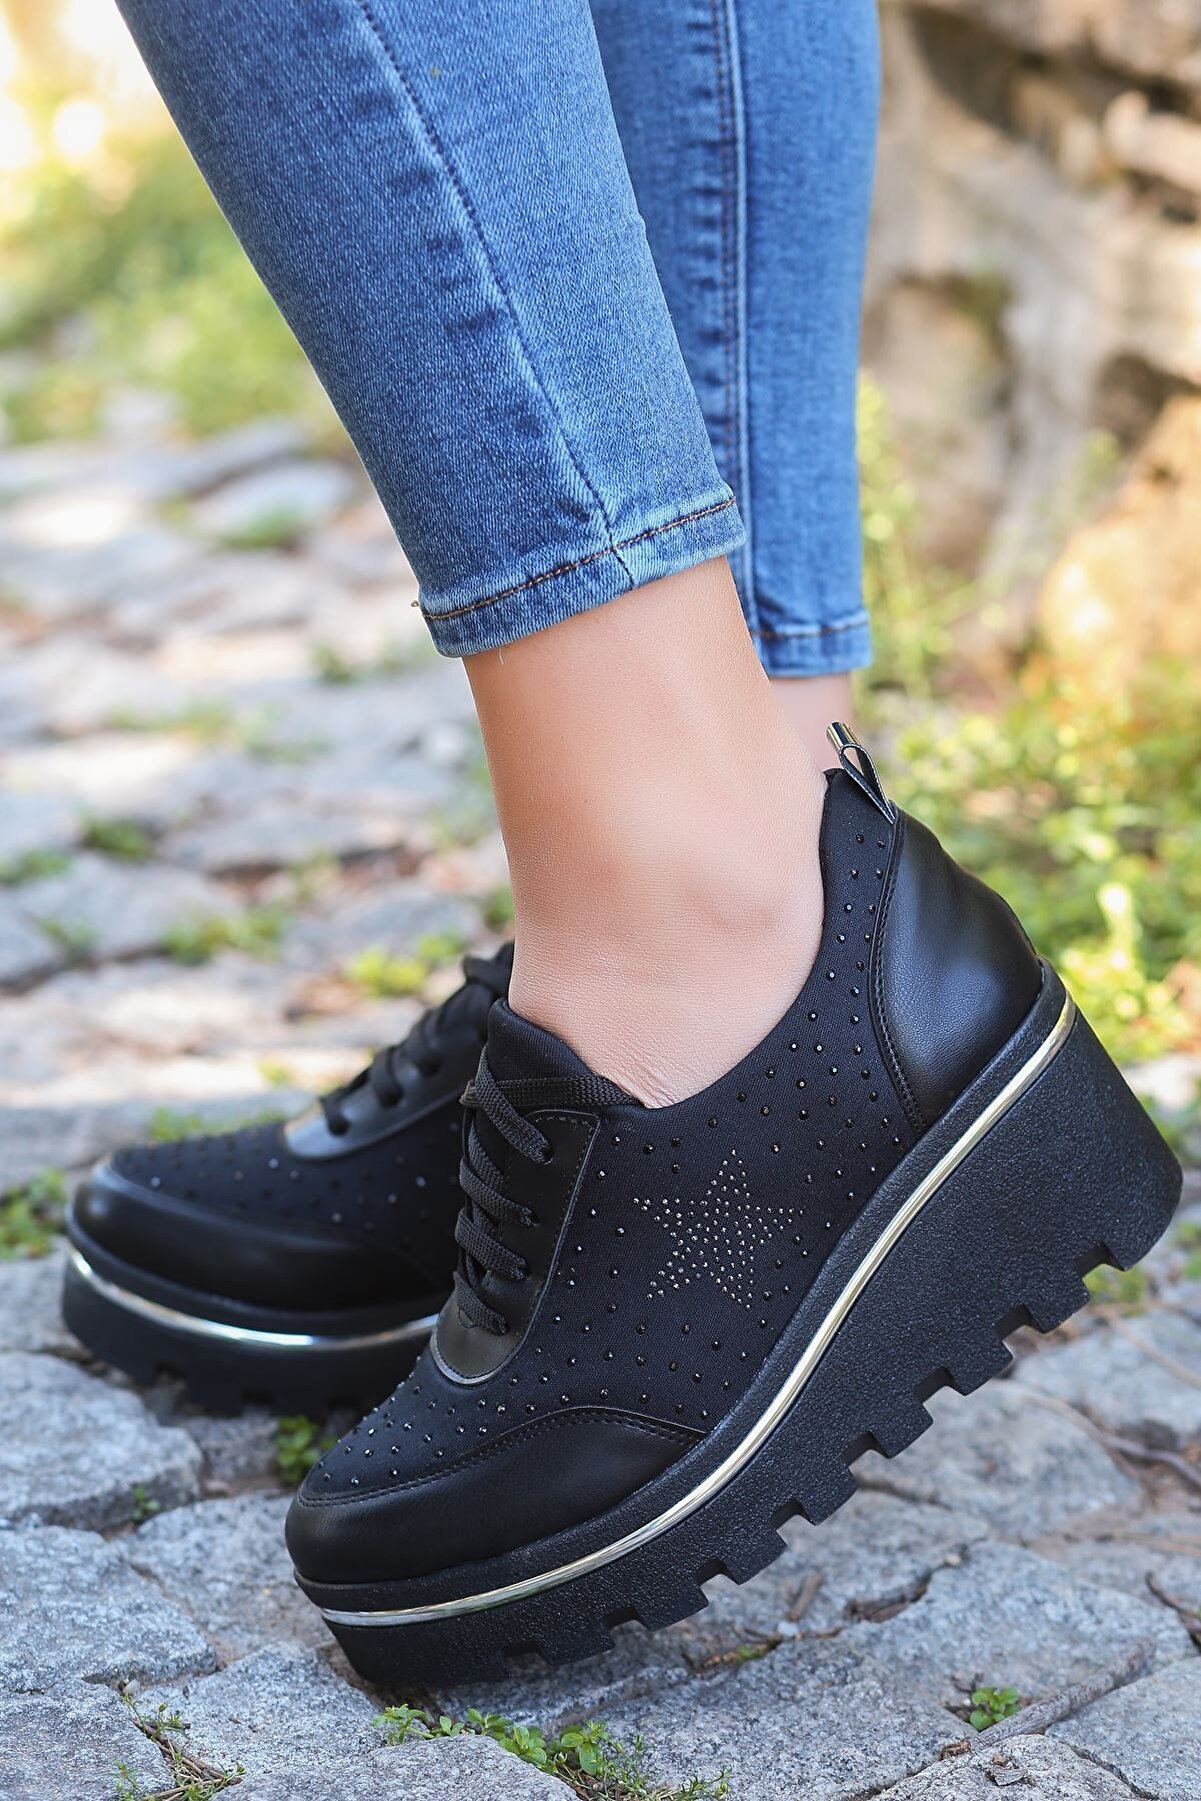 otuzbesshoes Dalgıç Kumaş Taş Detay Dolgu Yeni Topuk Ayakkabı